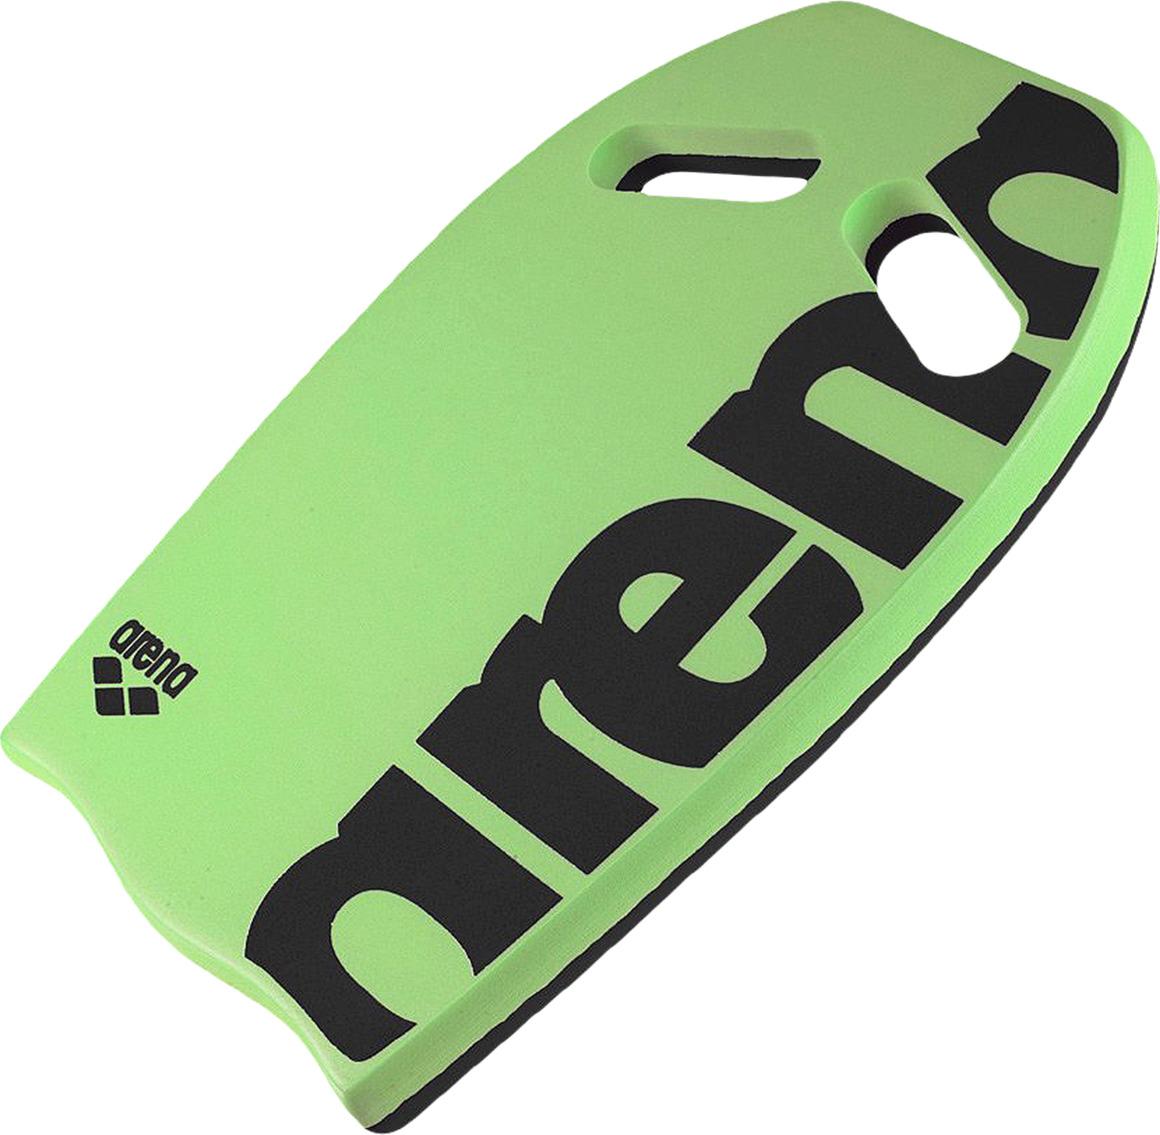 Доска для плавания Arena Kickboard, цвет: зеленый. 95275 60 шапочка для плавания arena polyester  цвет  темно синий